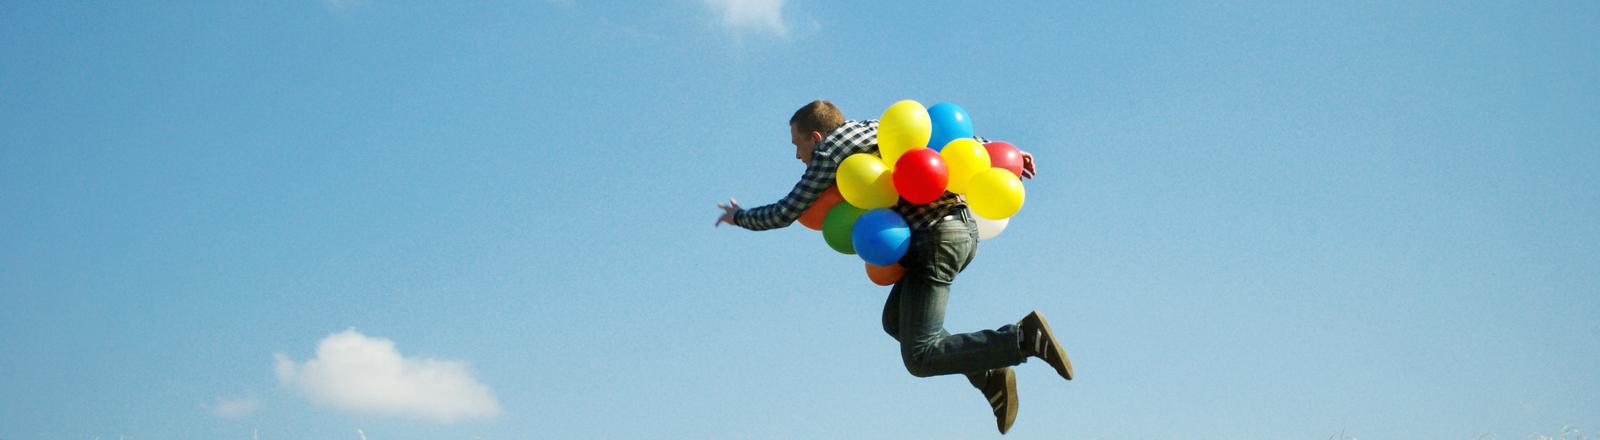 Mann fliegt mit Balons